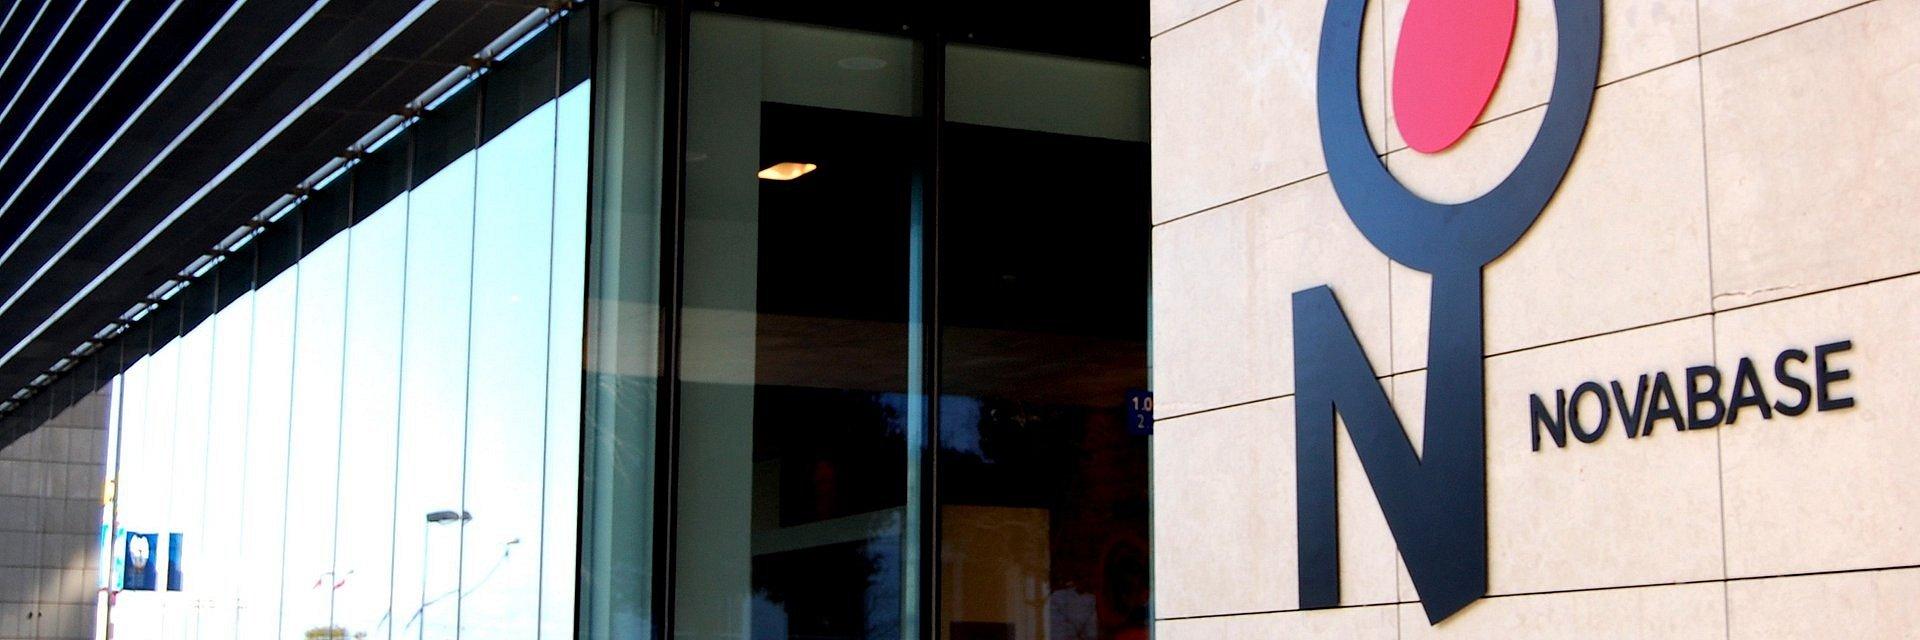 Novabase distinguida pela Euronext